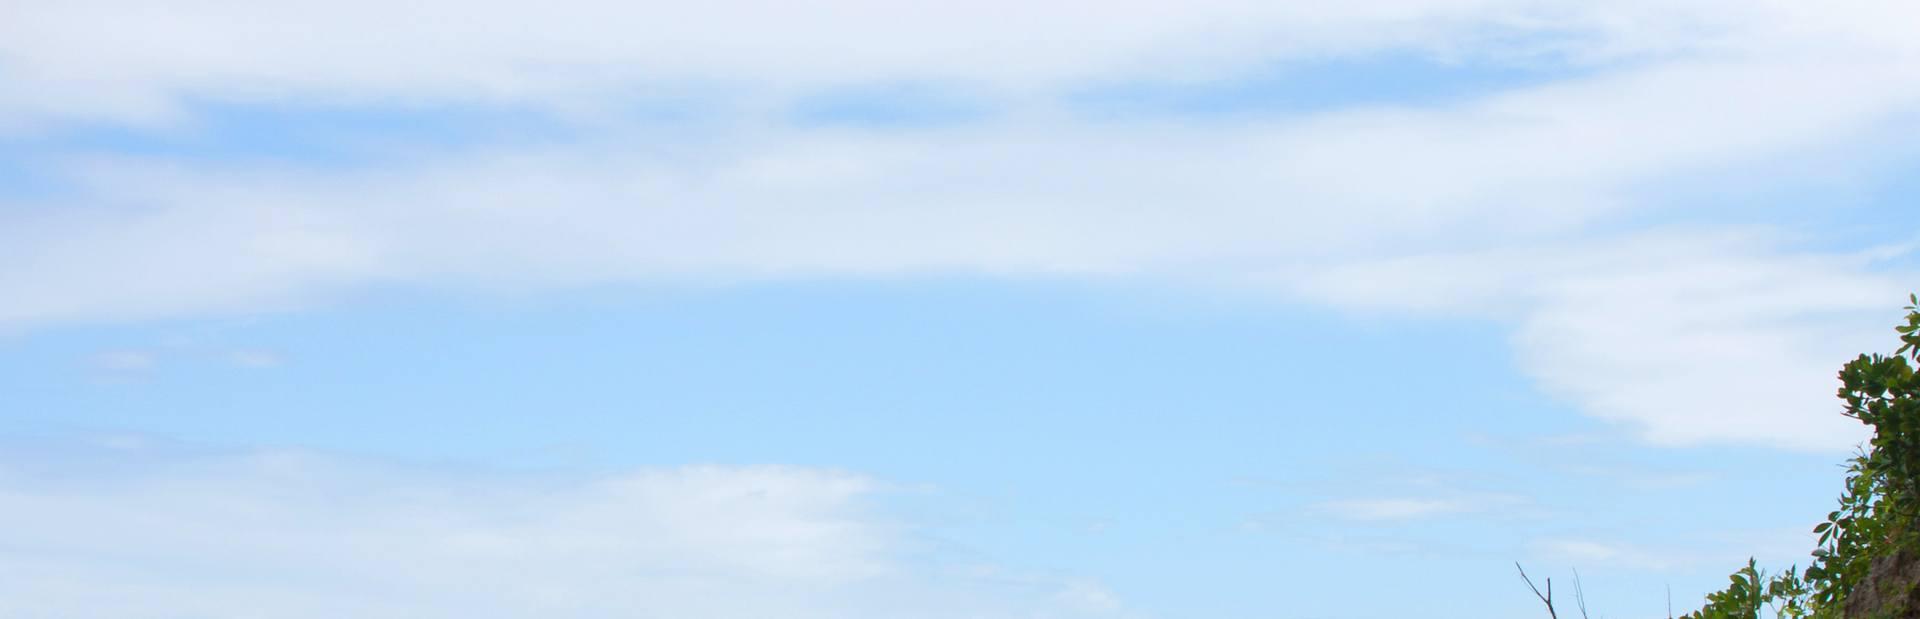 Barbuda climate photo